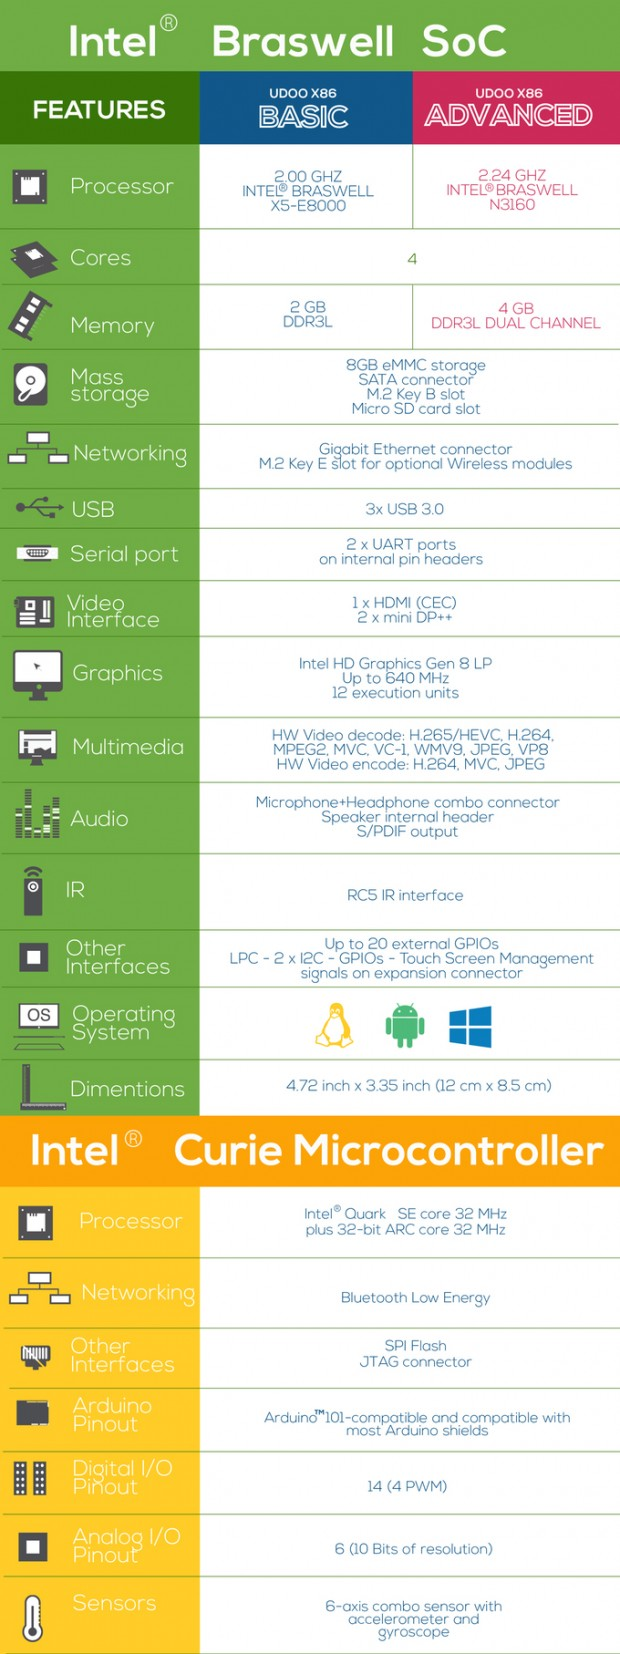 udoo_x86_intel_atom_celeron_arduino_101_development_board_4